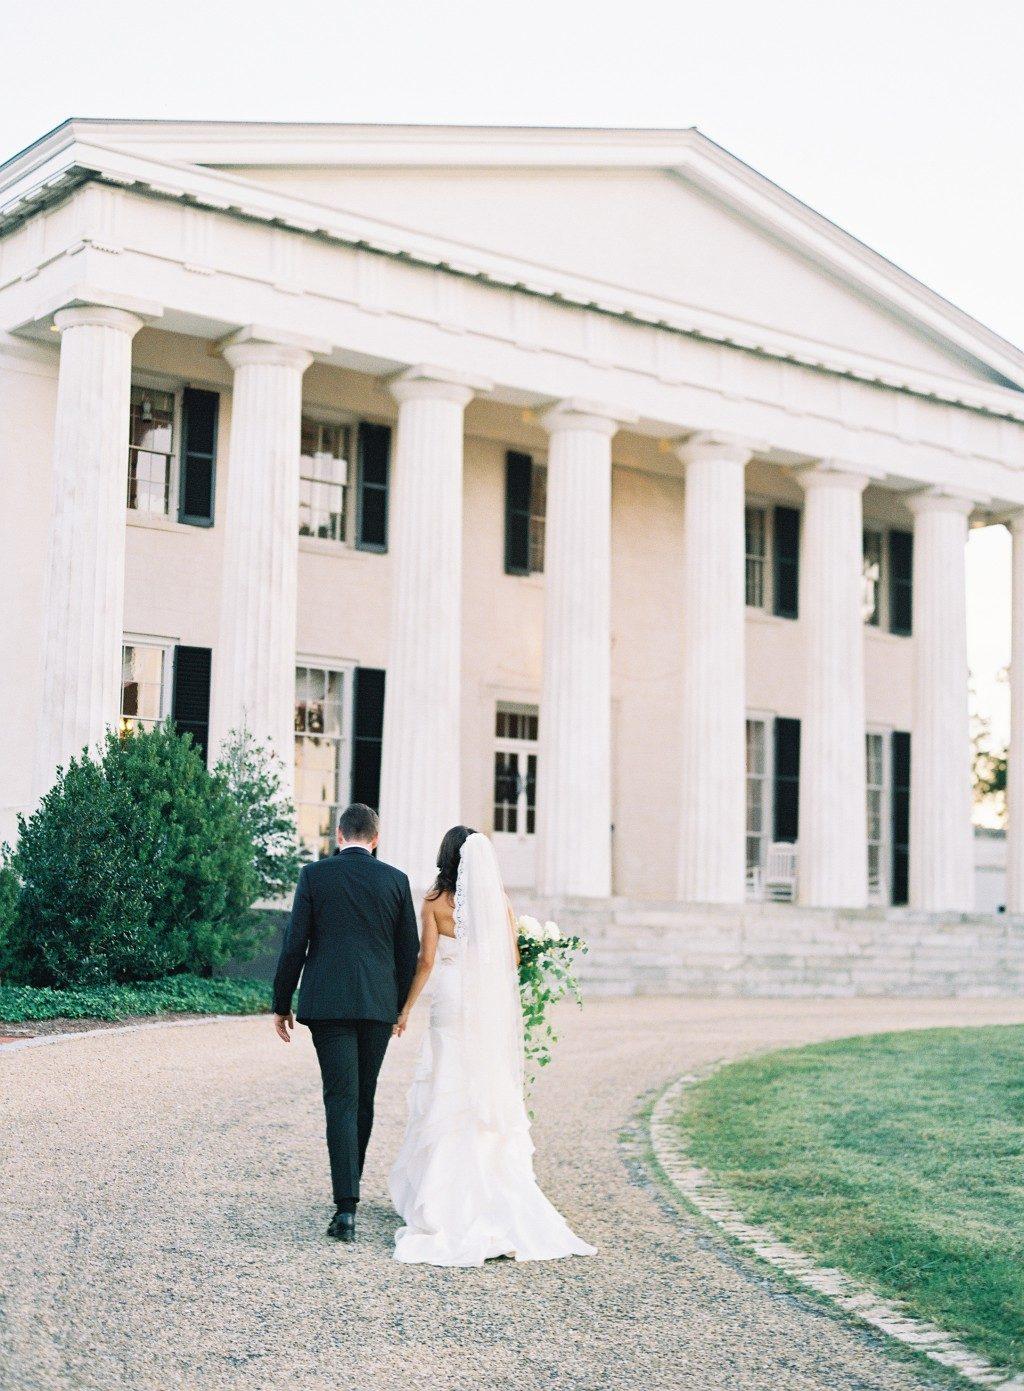 Classic Bella Figura wedding at Berry Hill Resort in South Boston, Virginia